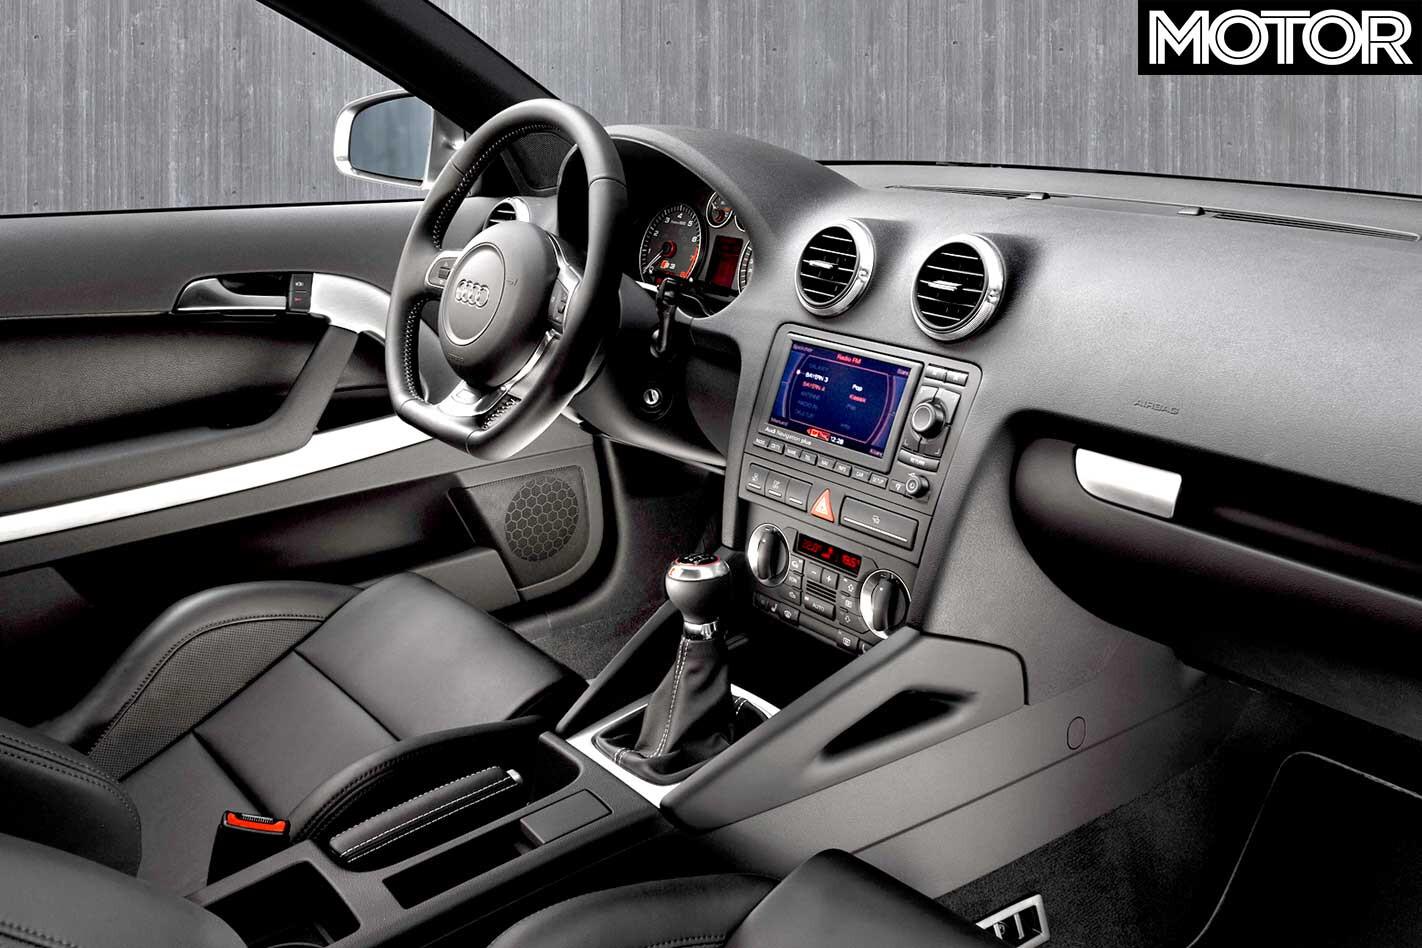 2006 Audi S 3 Interior Jpg